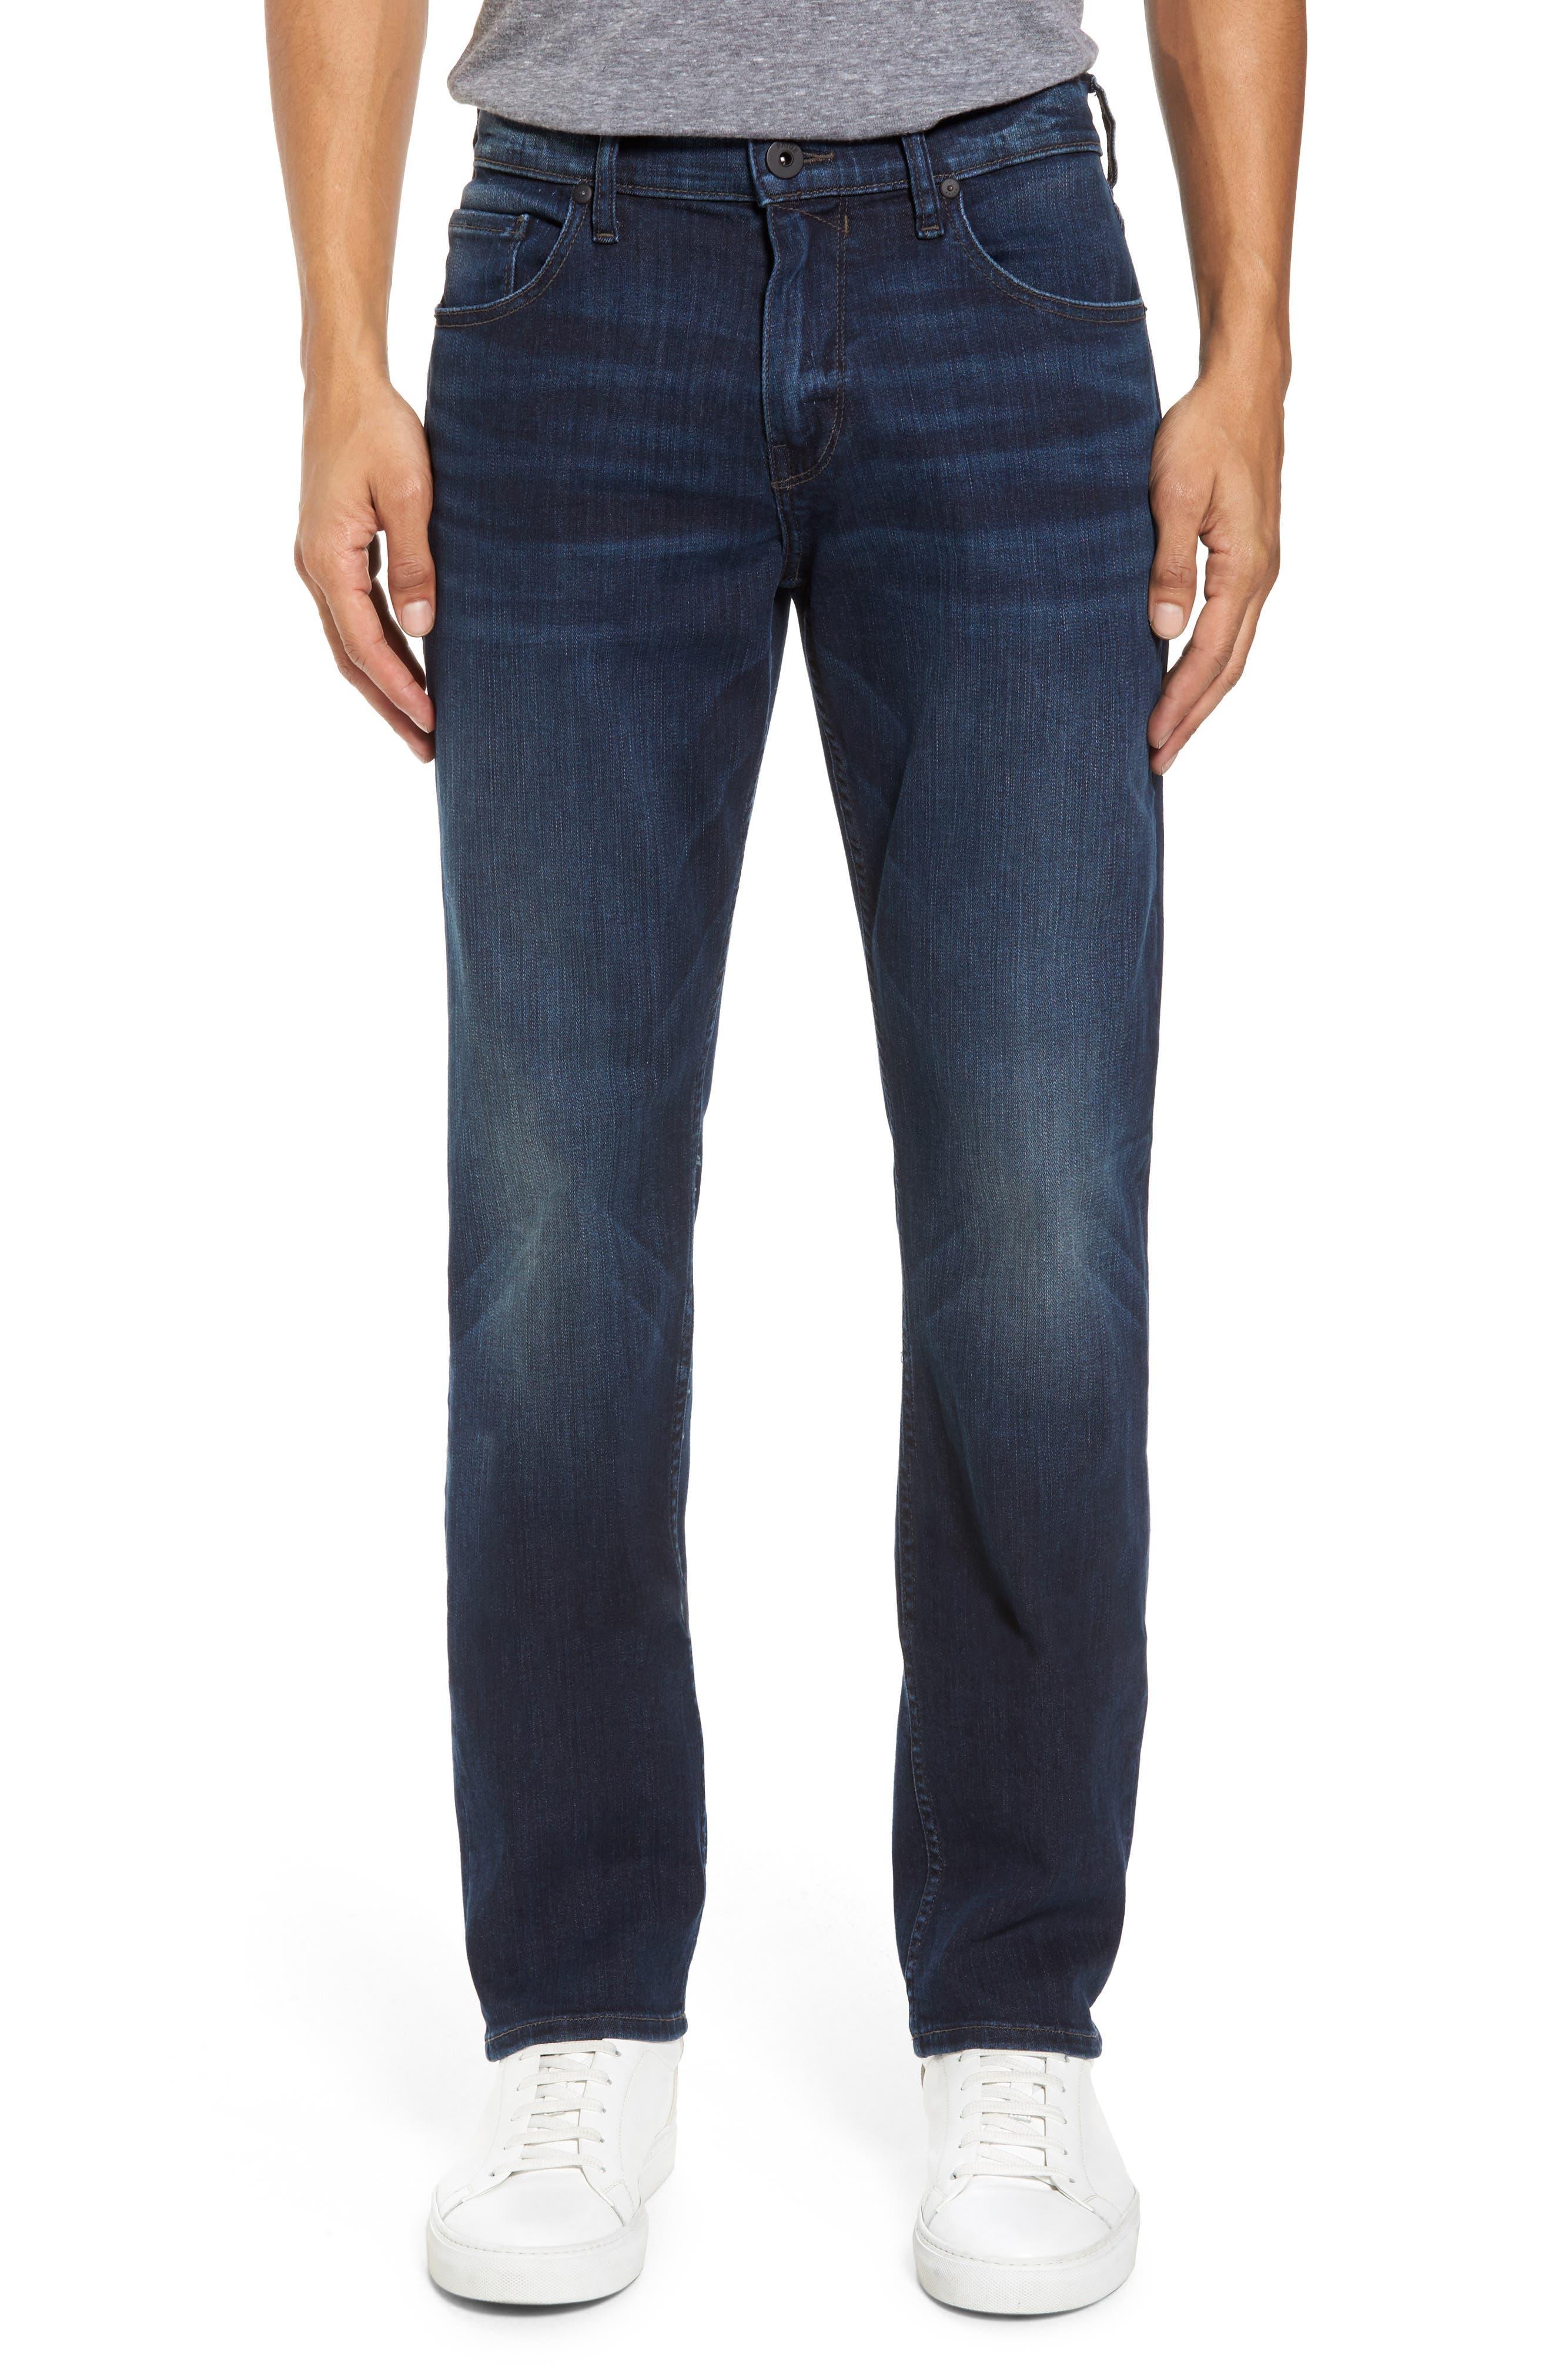 Transcend - Federal Slim Straight Leg Jeans,                             Main thumbnail 1, color,                             Graham